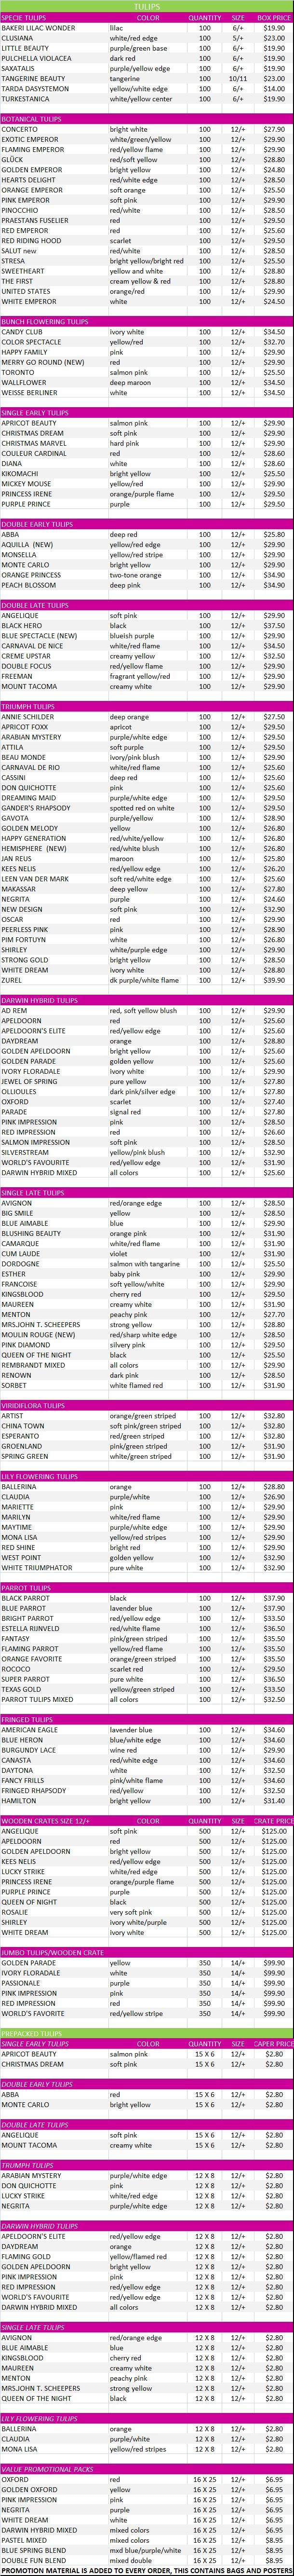 Tulip Price List, Fall 2015